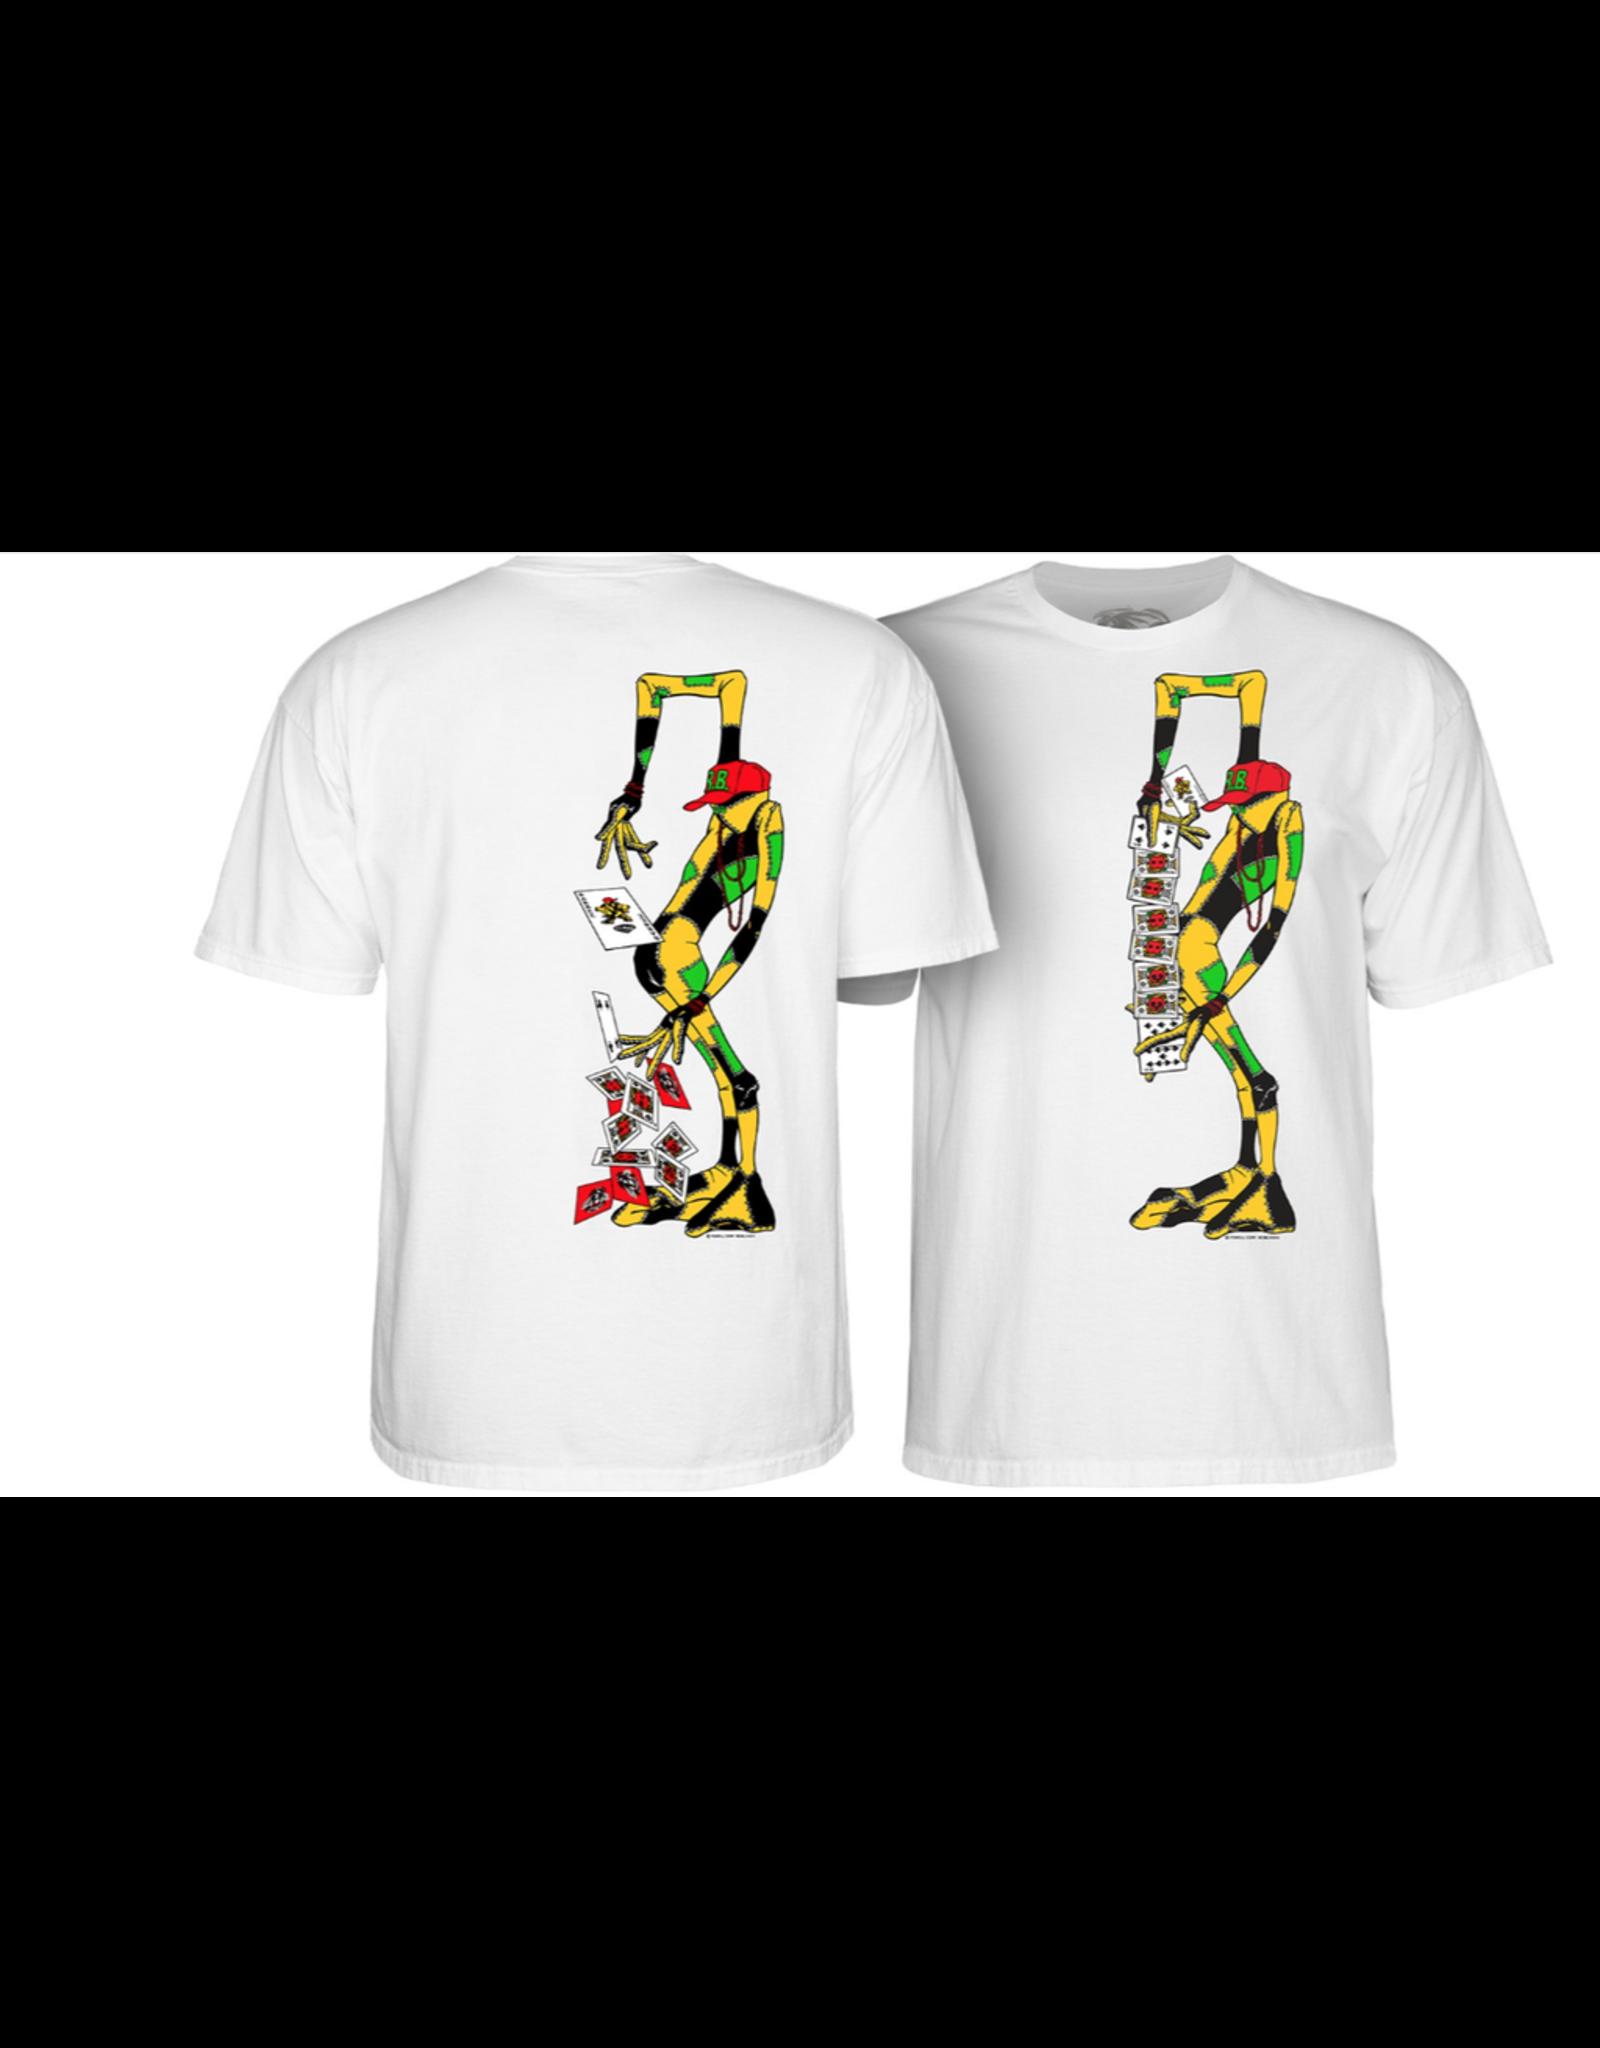 POWELL Powell Peralta Ray Barbee Rag Doll T-Shirt White